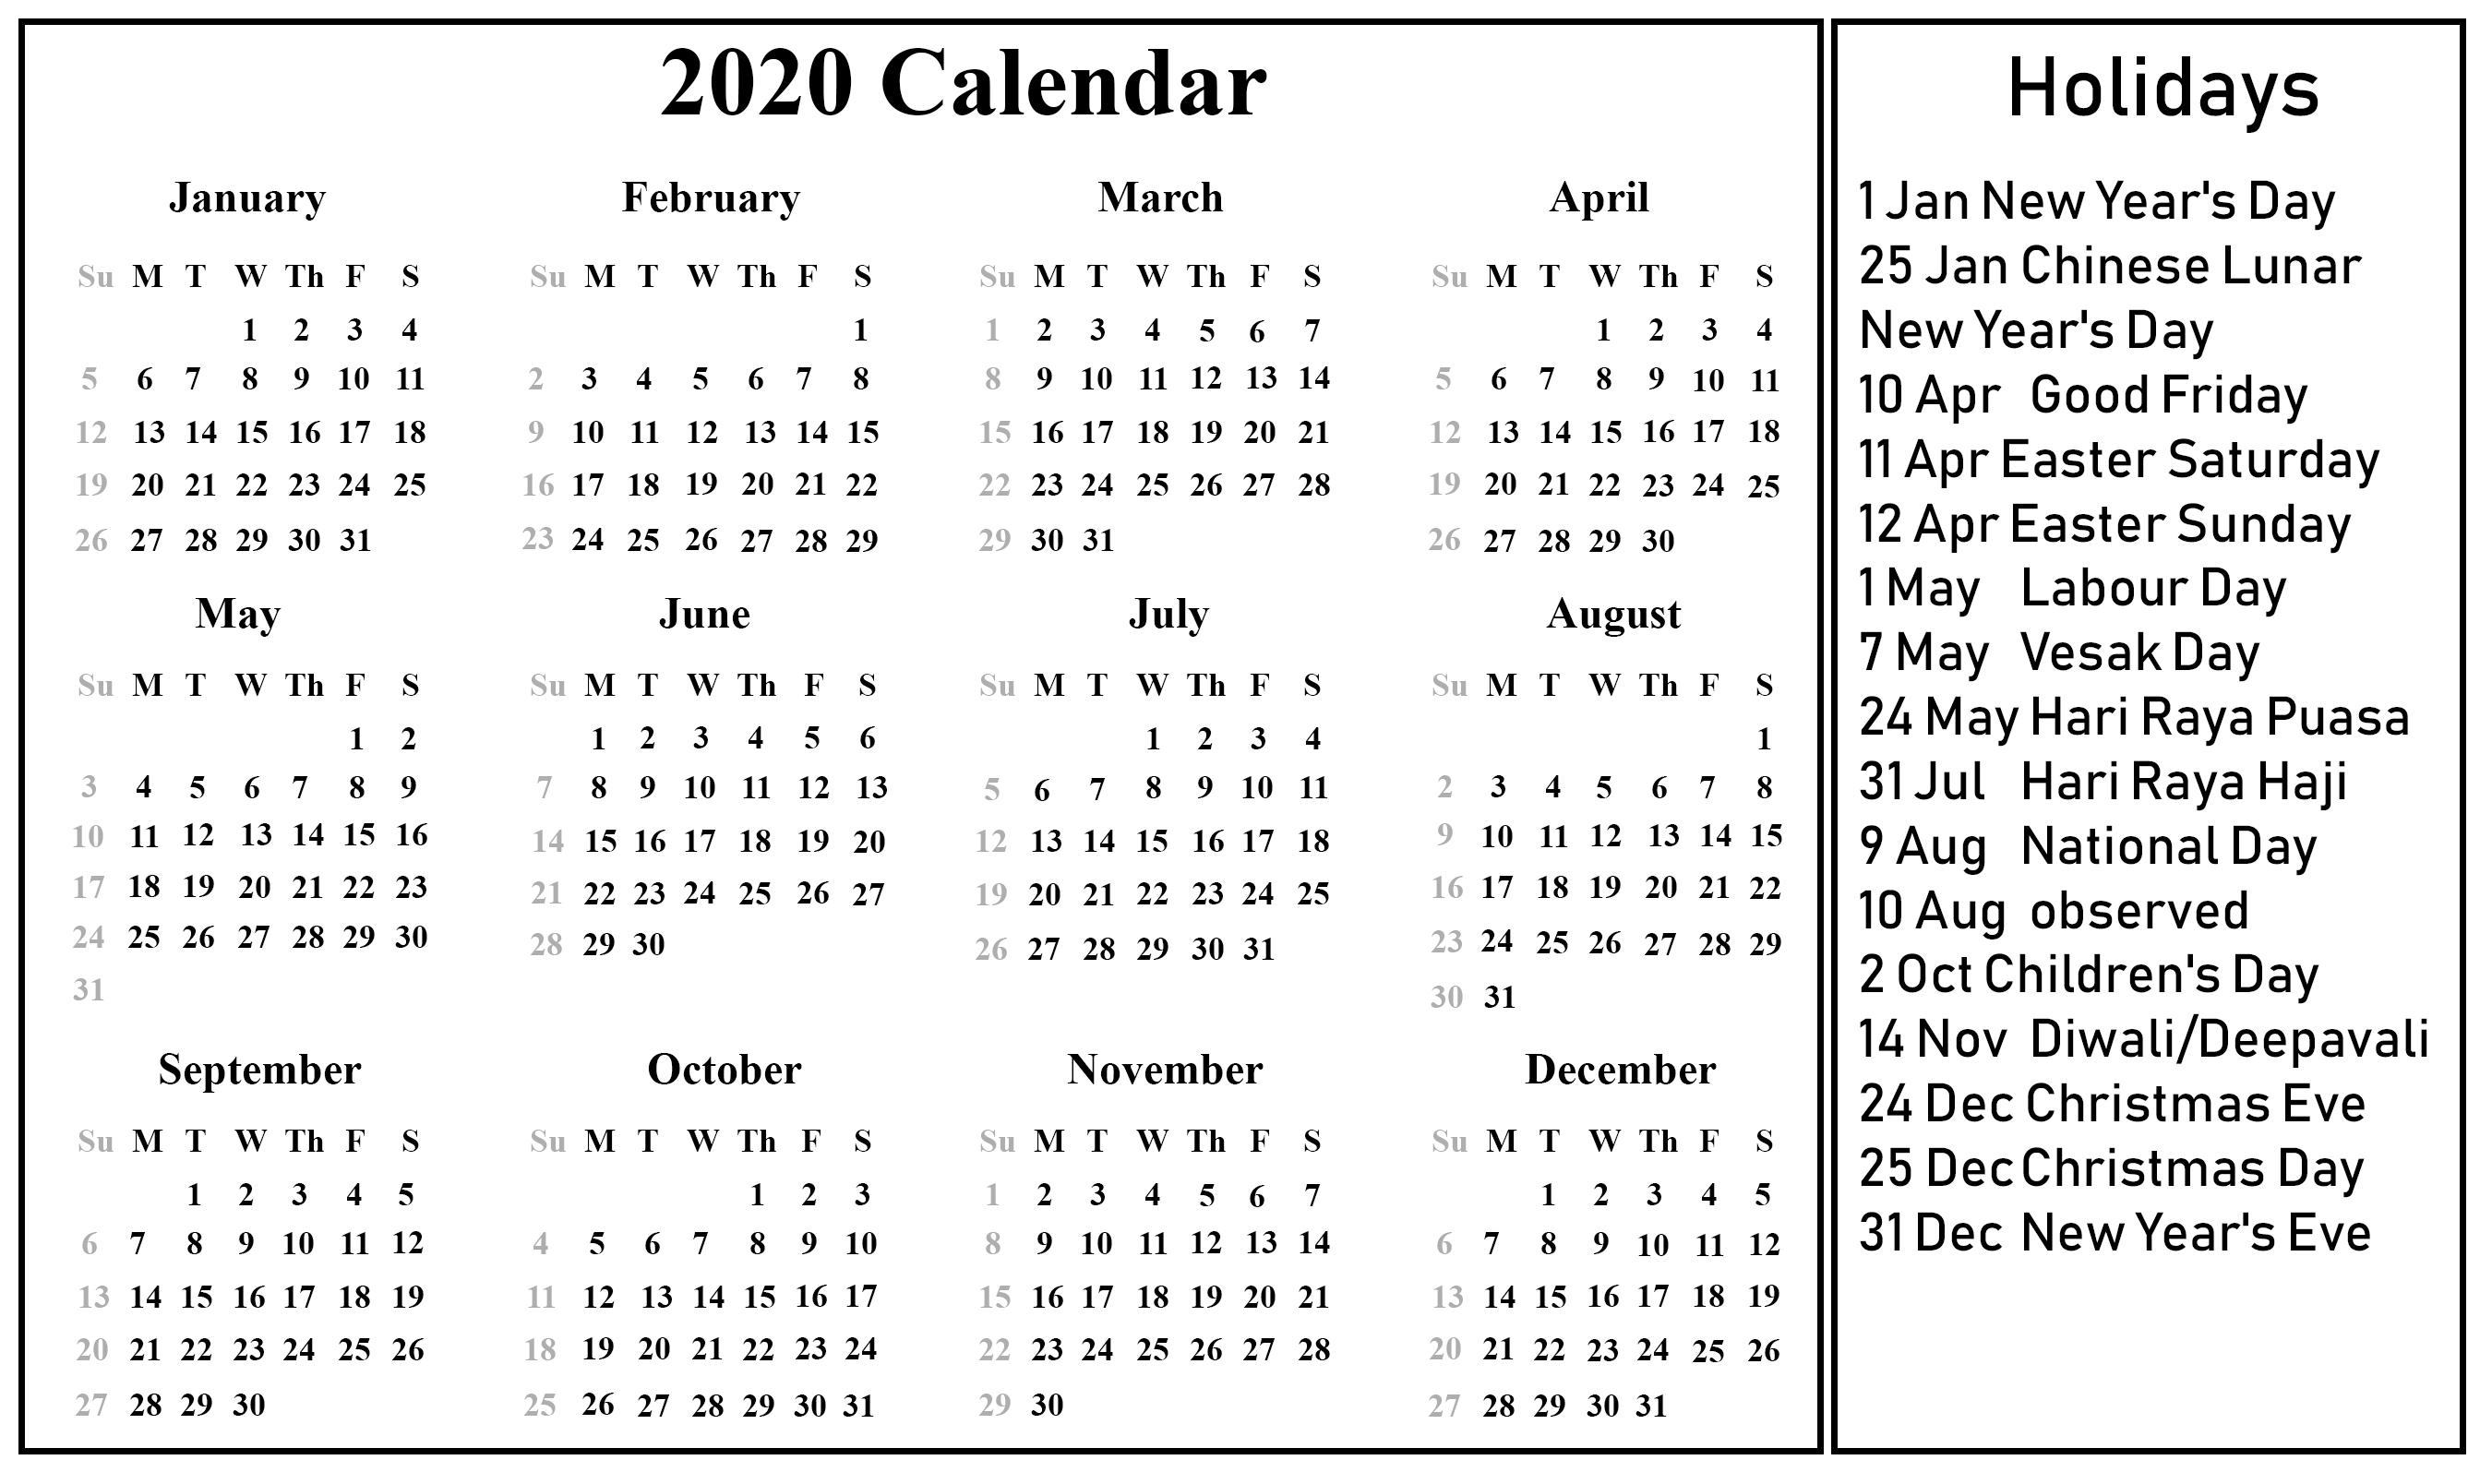 Free Printable Singapore Calendar 2020 {Pdf, Excel & Word-2020 Holidays Printable List